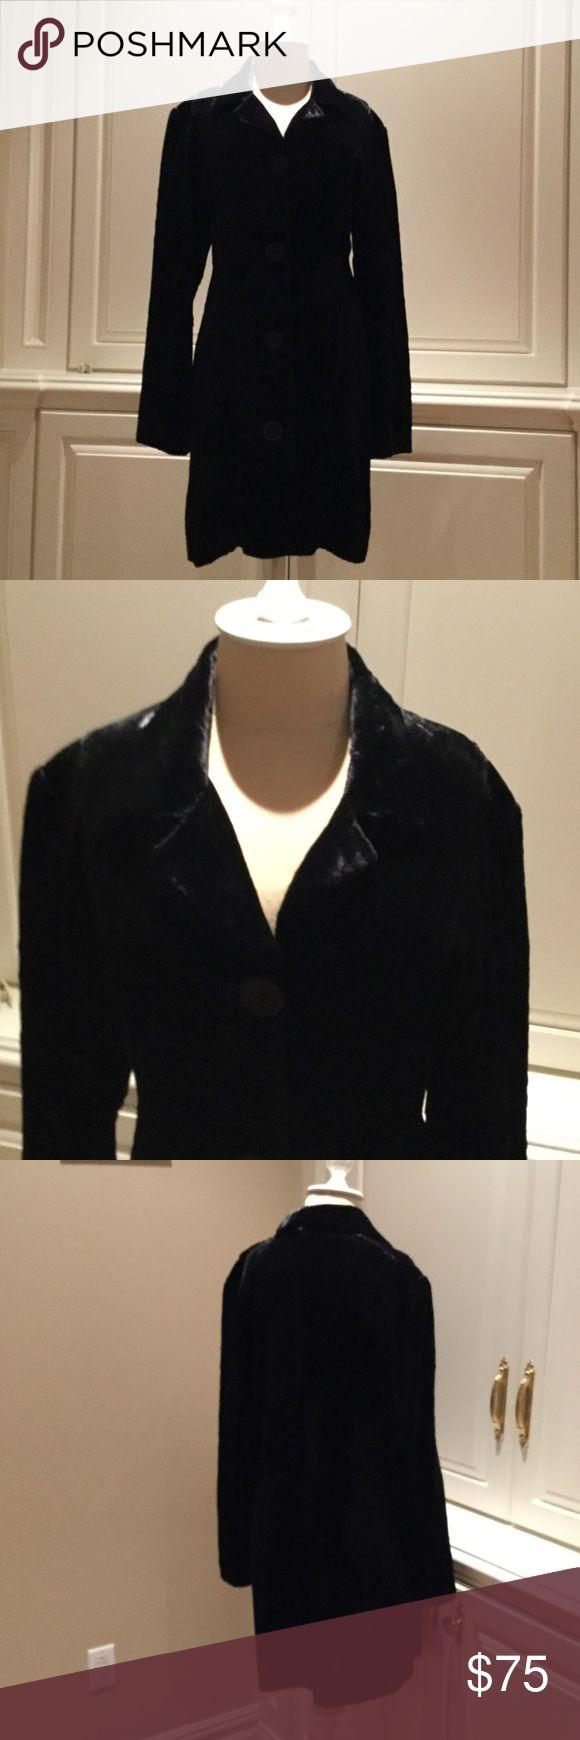 Black Velvet Jacket Black  Velvet dress coat. 4 buttons. jeffrey halper Jackets & Coats